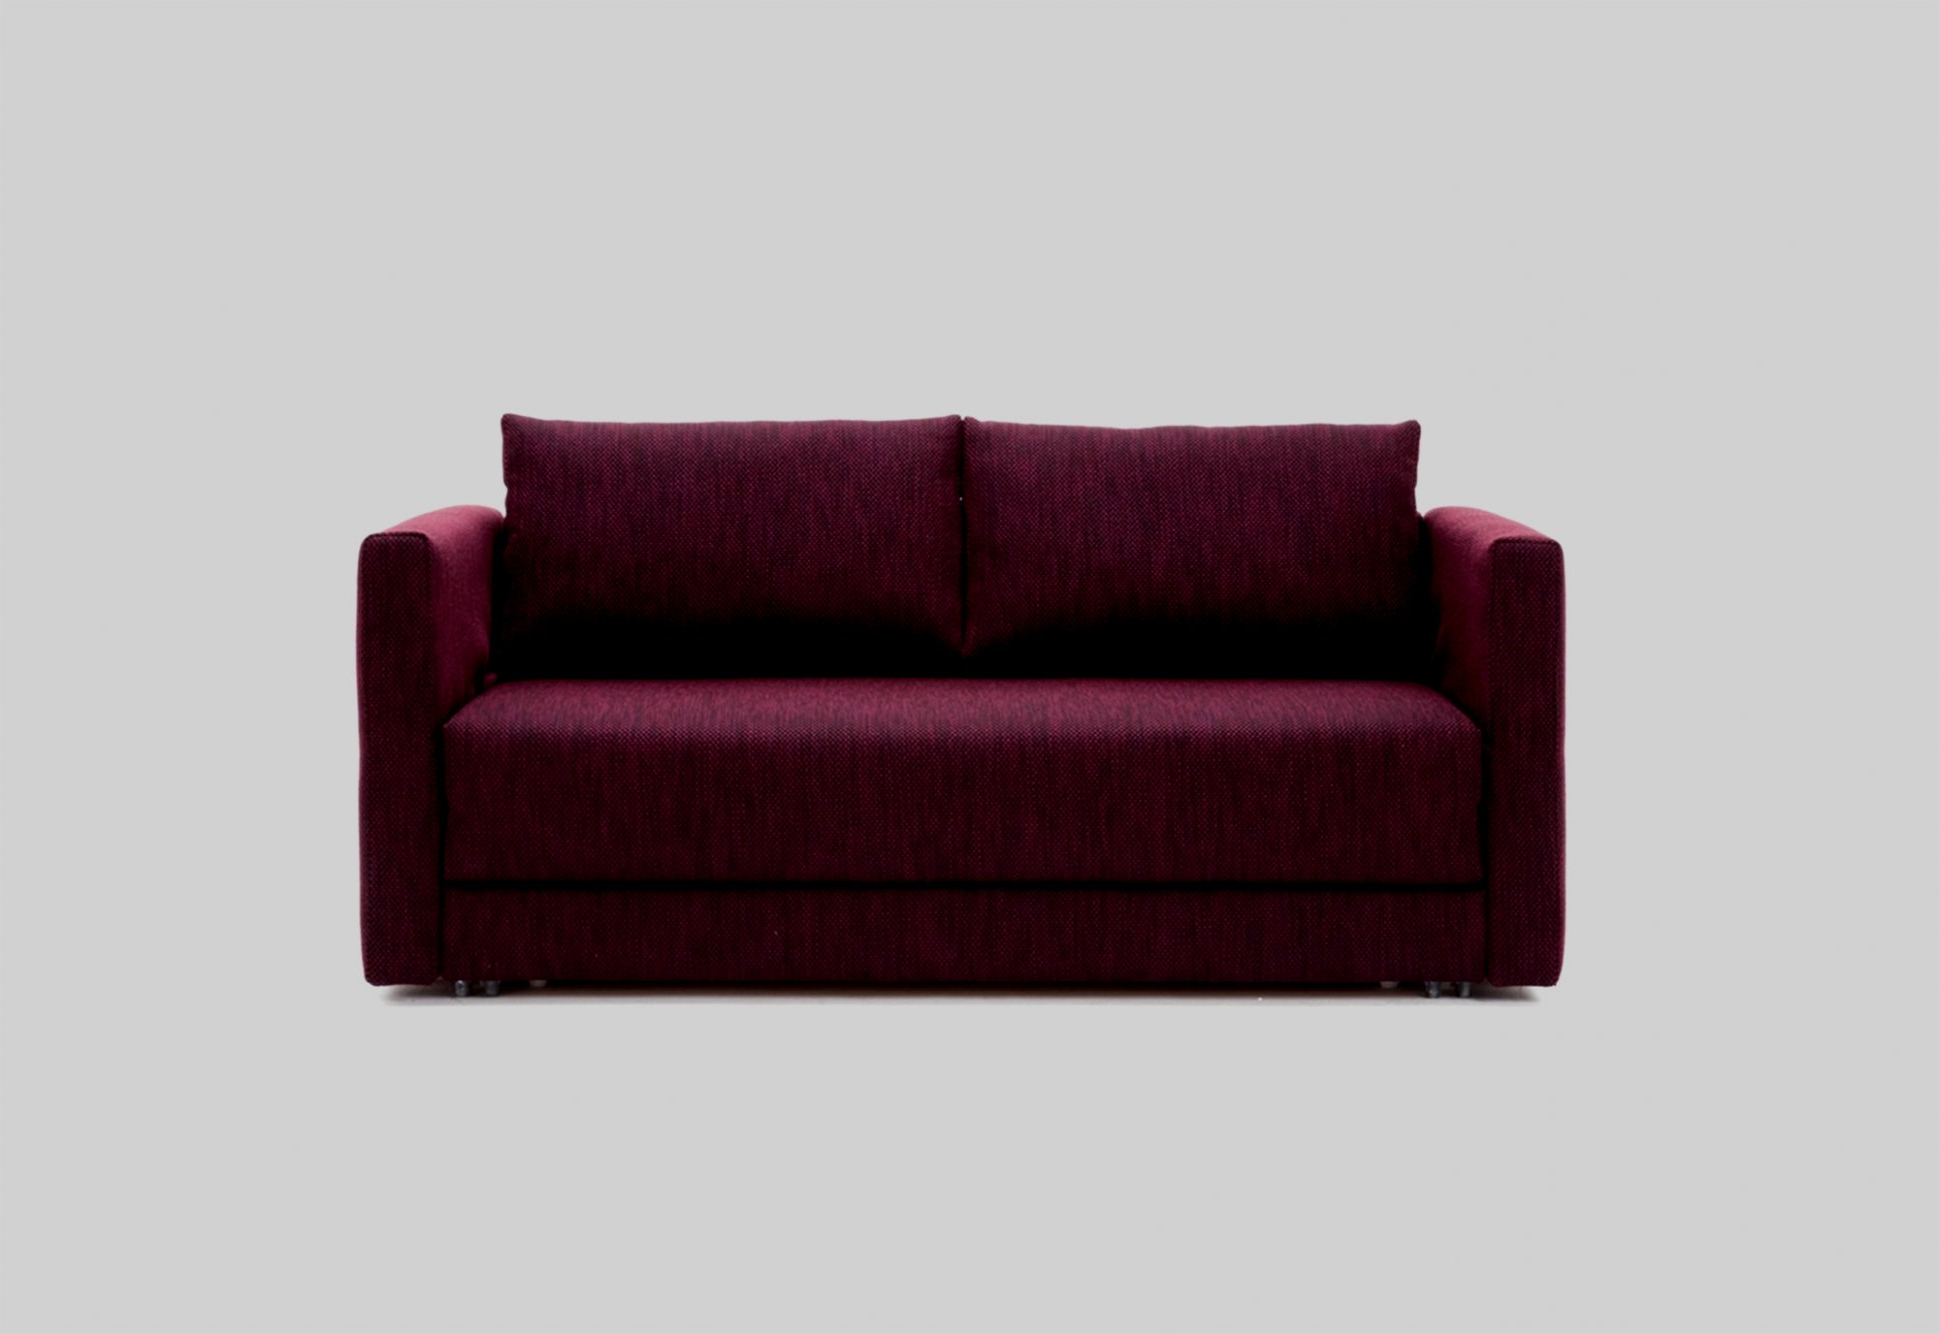 Sofa Chaise Longue Barato D0dg sofas Chaise Longue Baratos Modernos Lindo tolle sofas tolle sofas